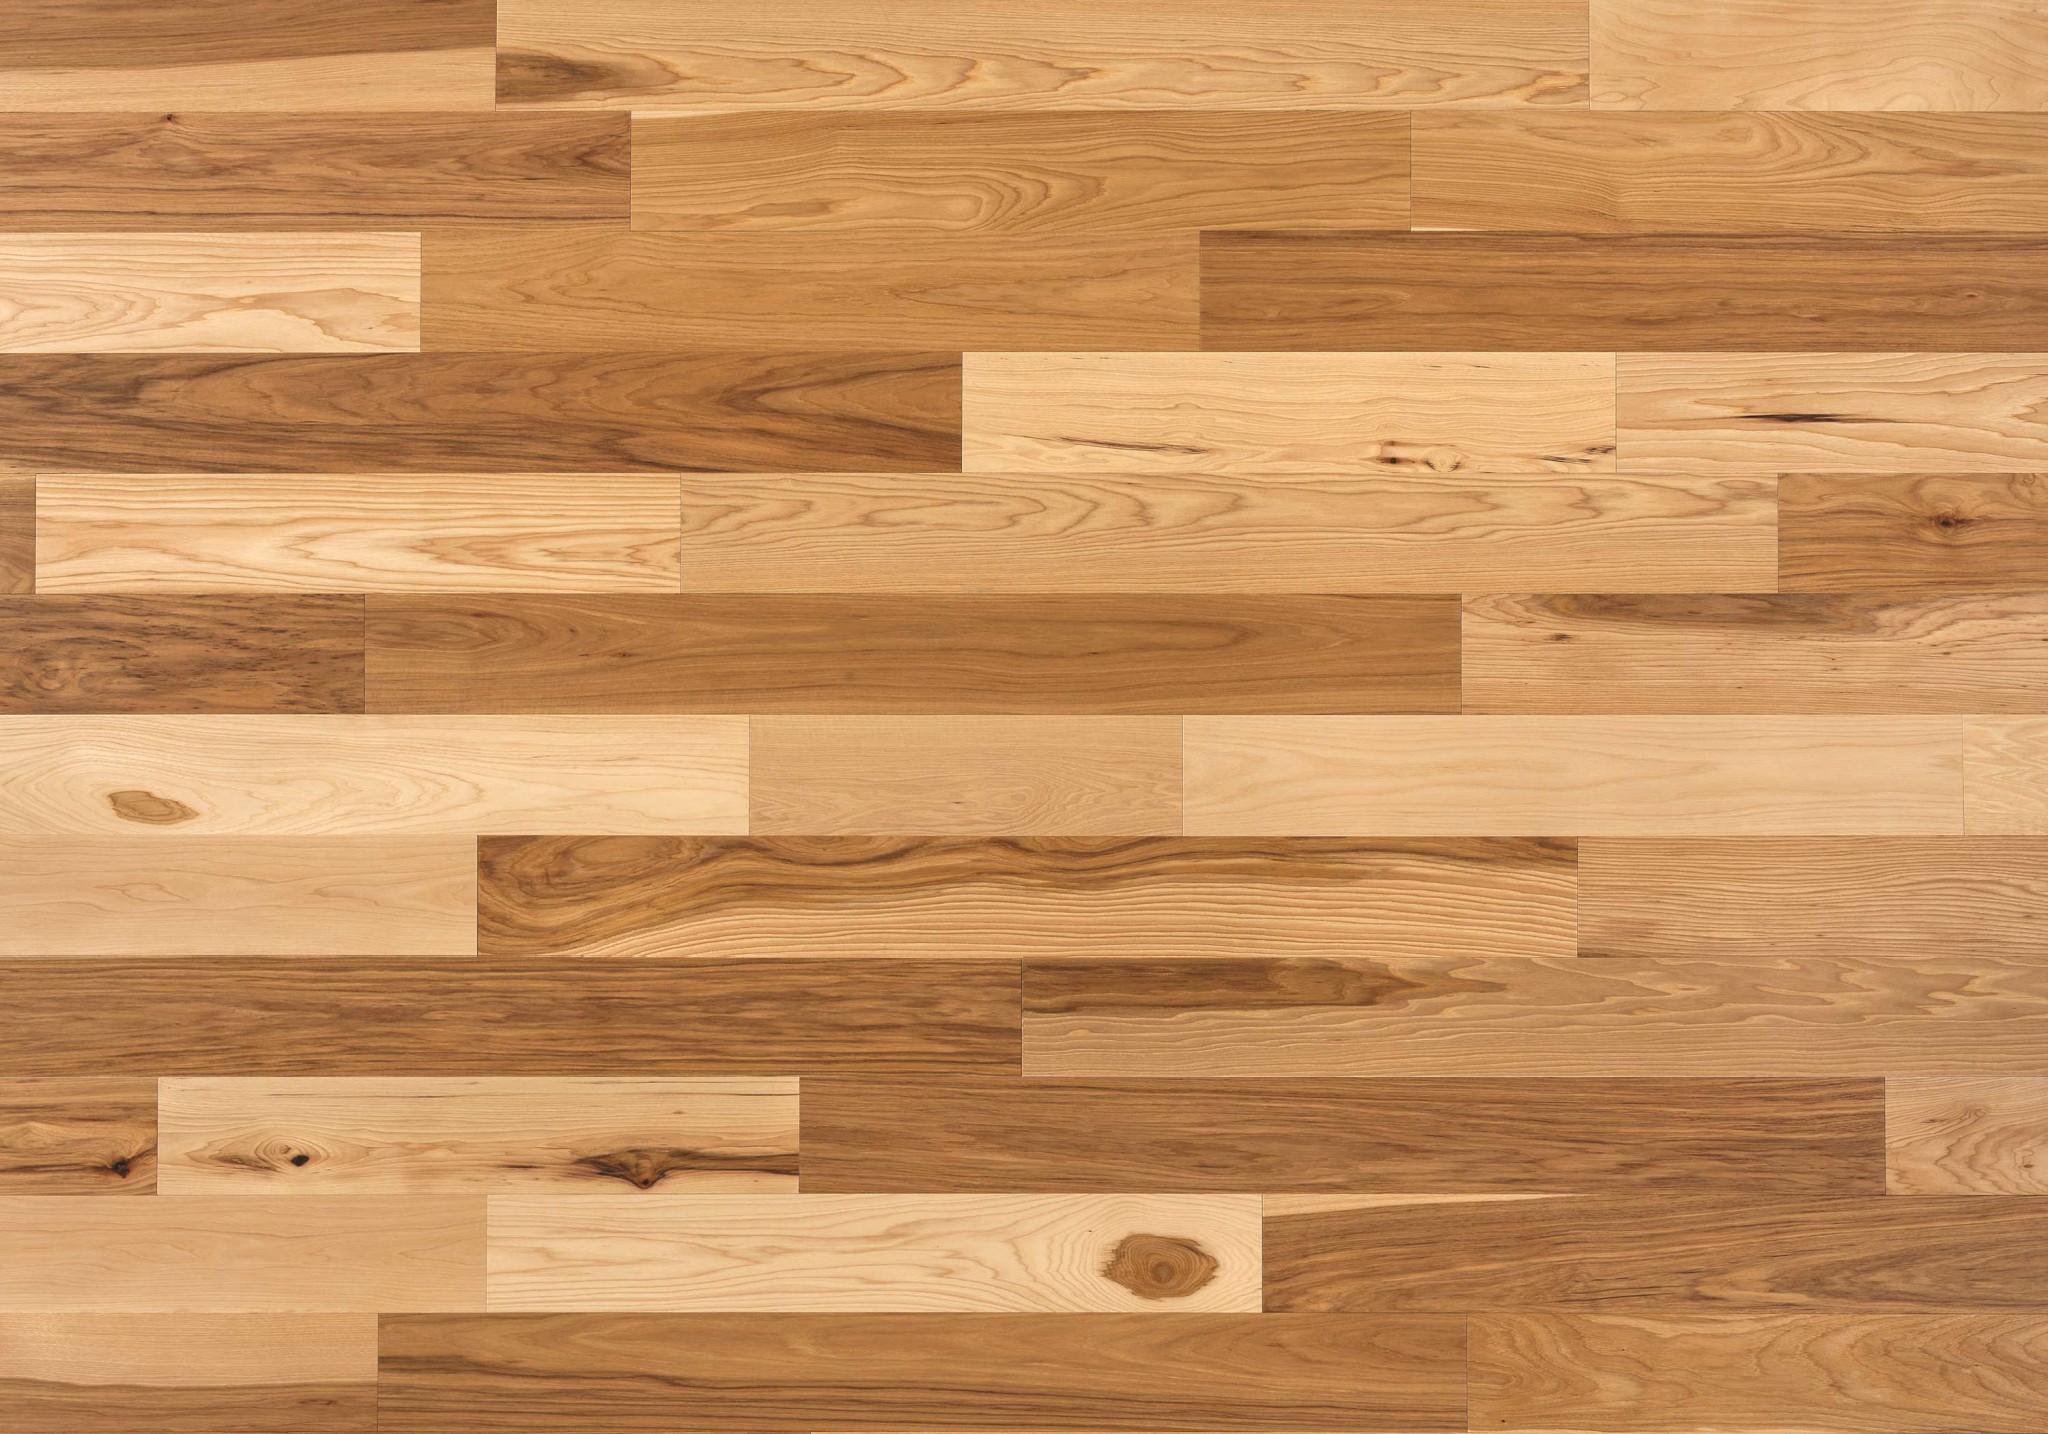 hickory hardwood flooring hickory hardwood ... CSEDESV